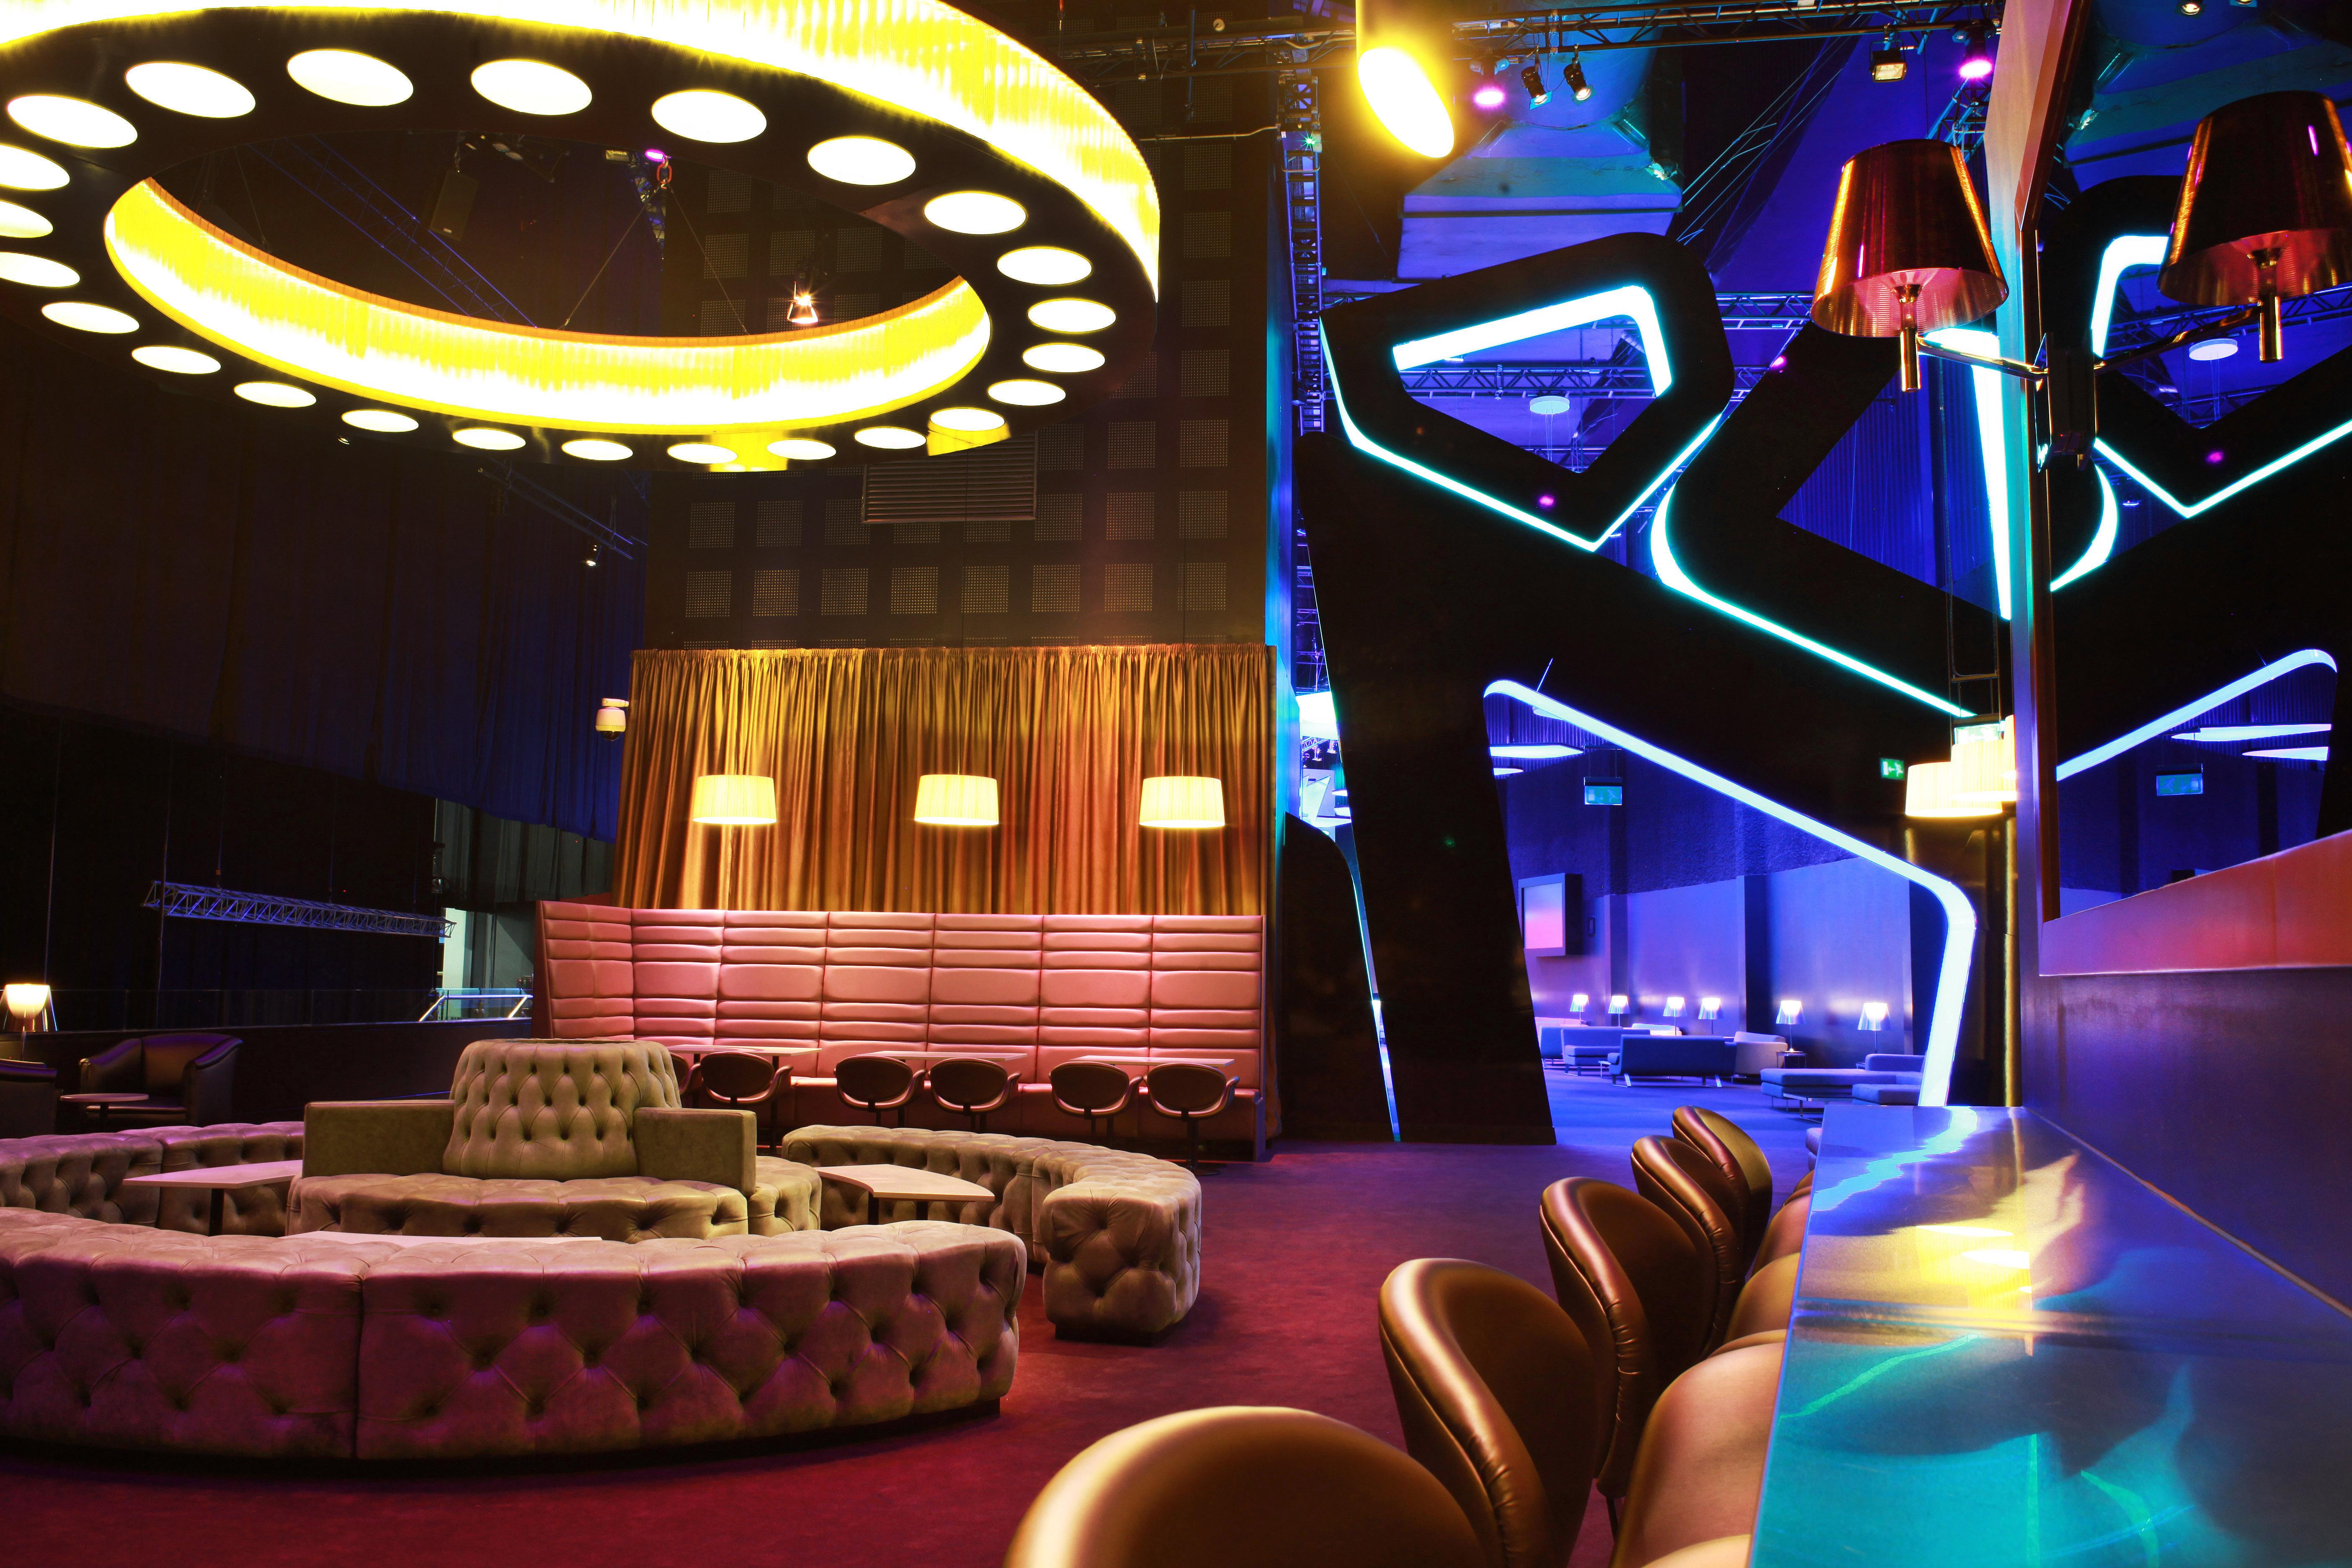 Sky bar, backstage at the O2.